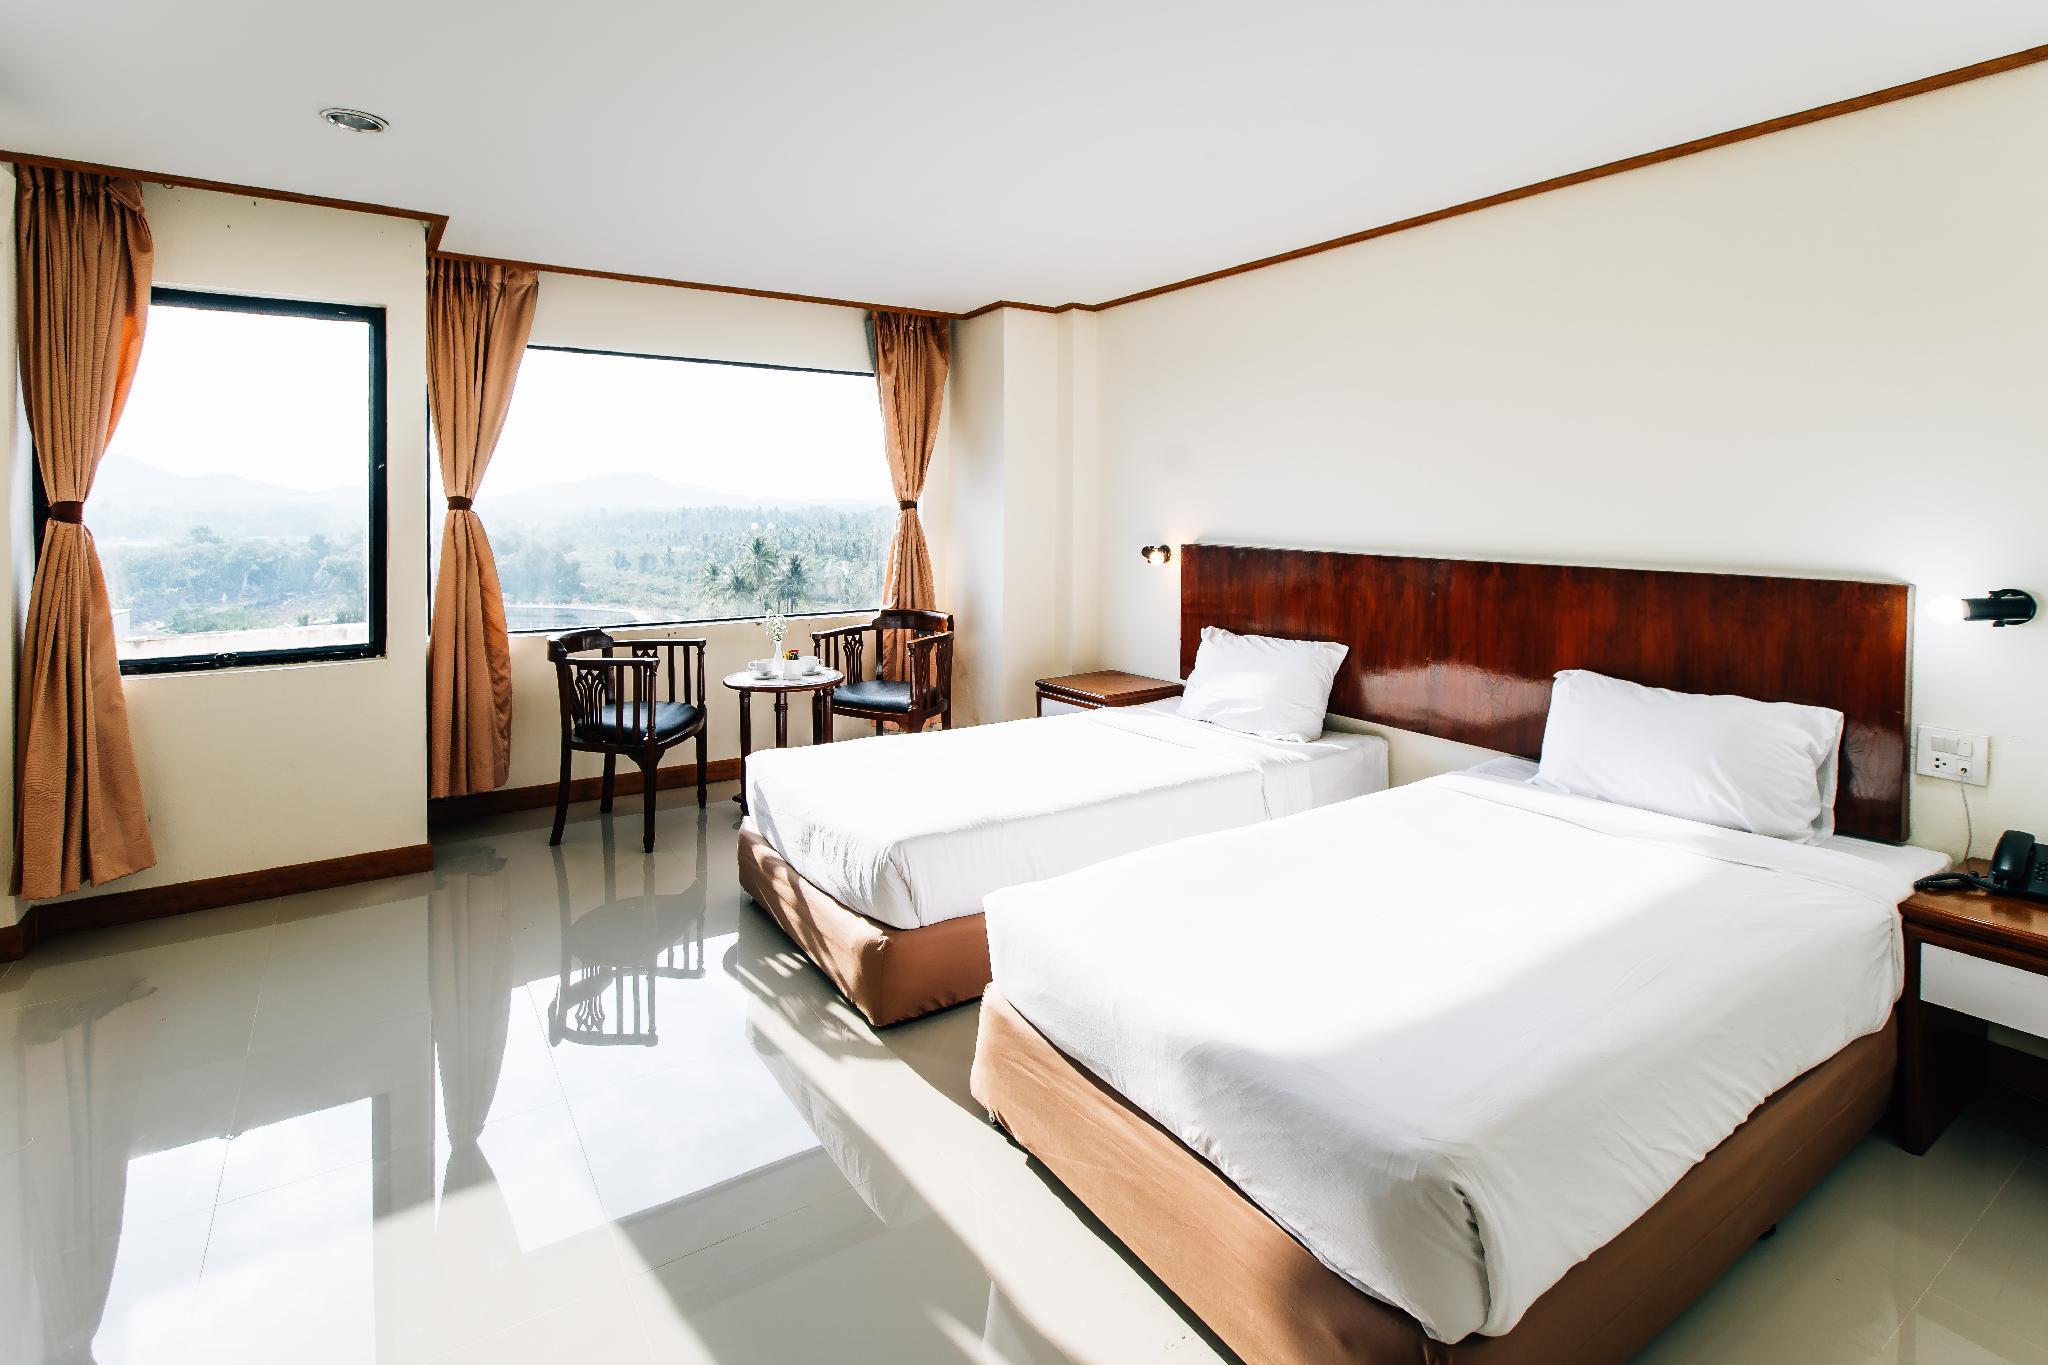 Sinkiat Thani Hotel